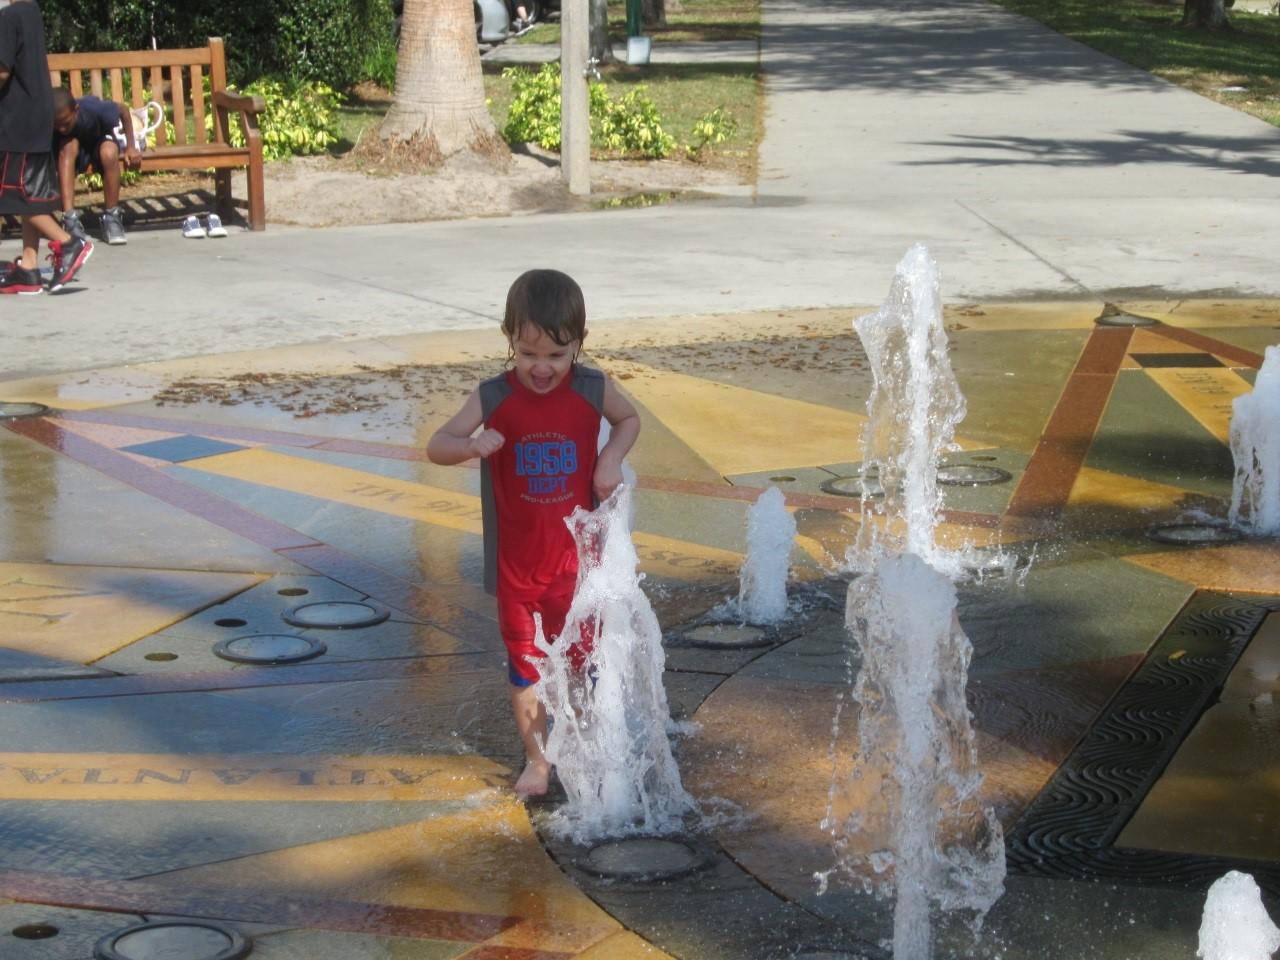 kids activities Celebration splash park